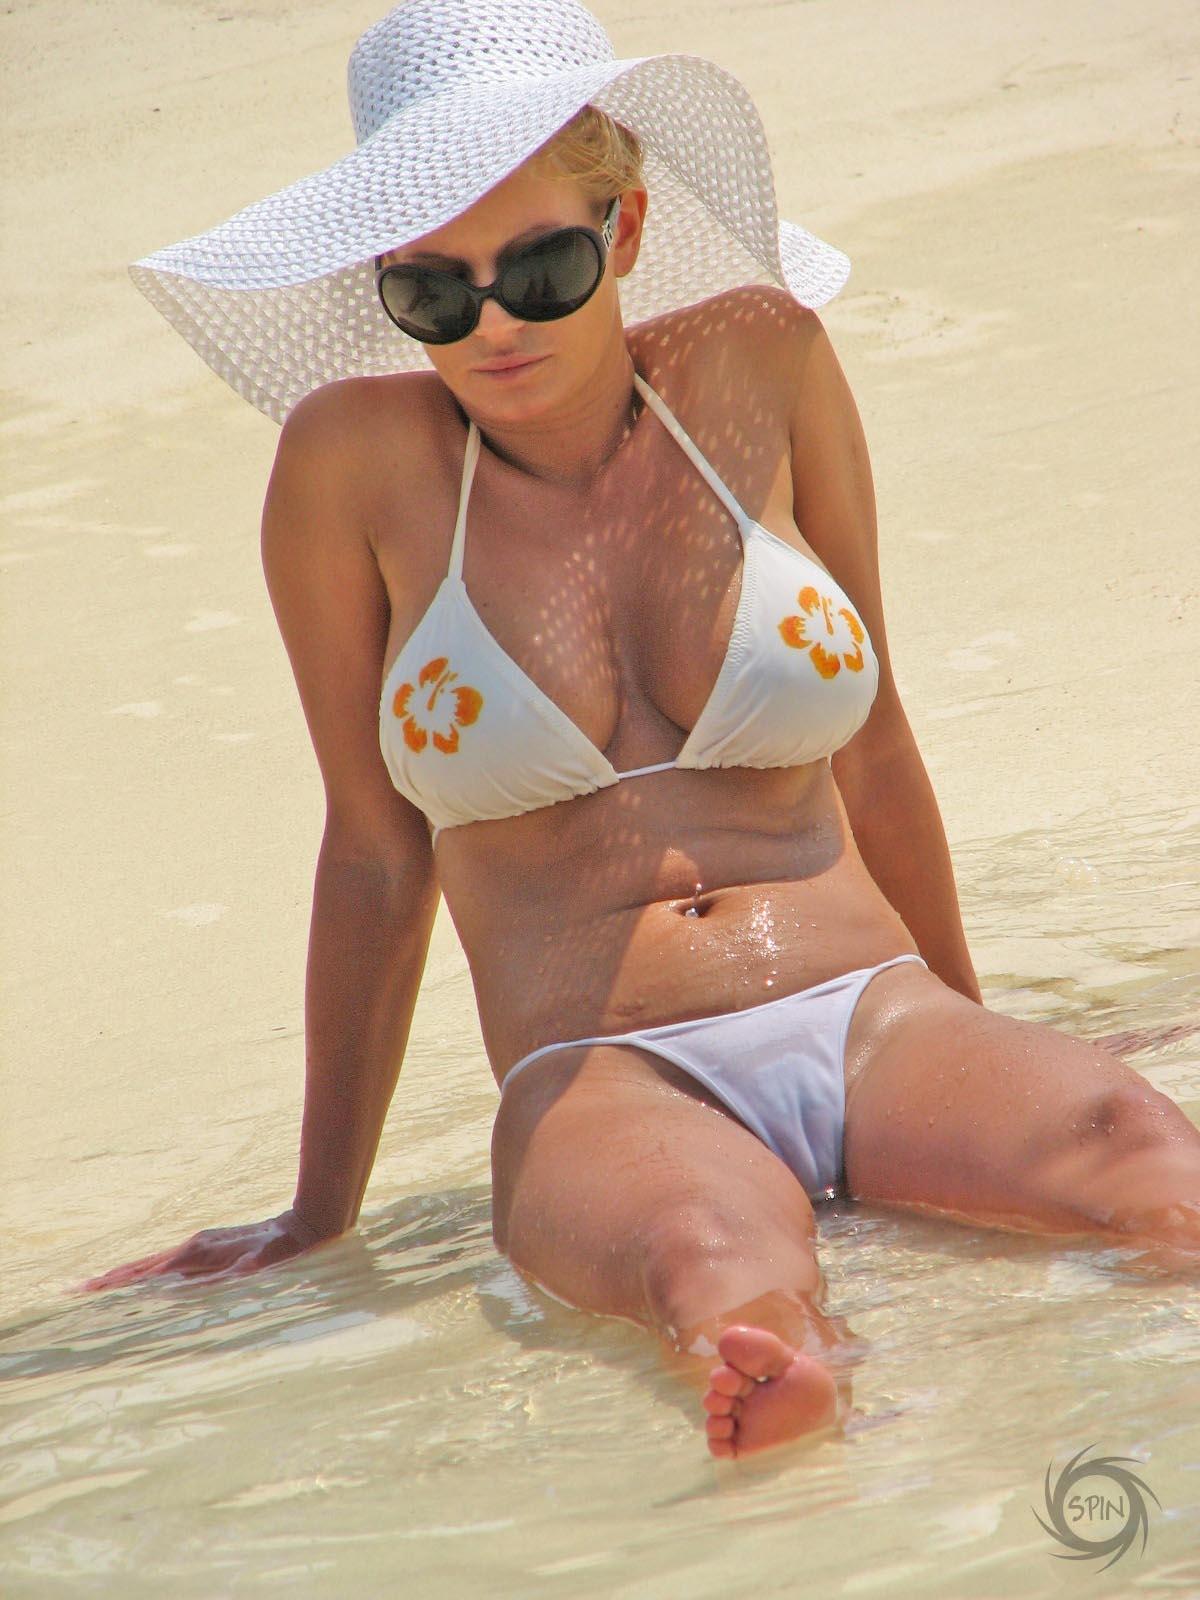 Naked pics jessica simpson bikini